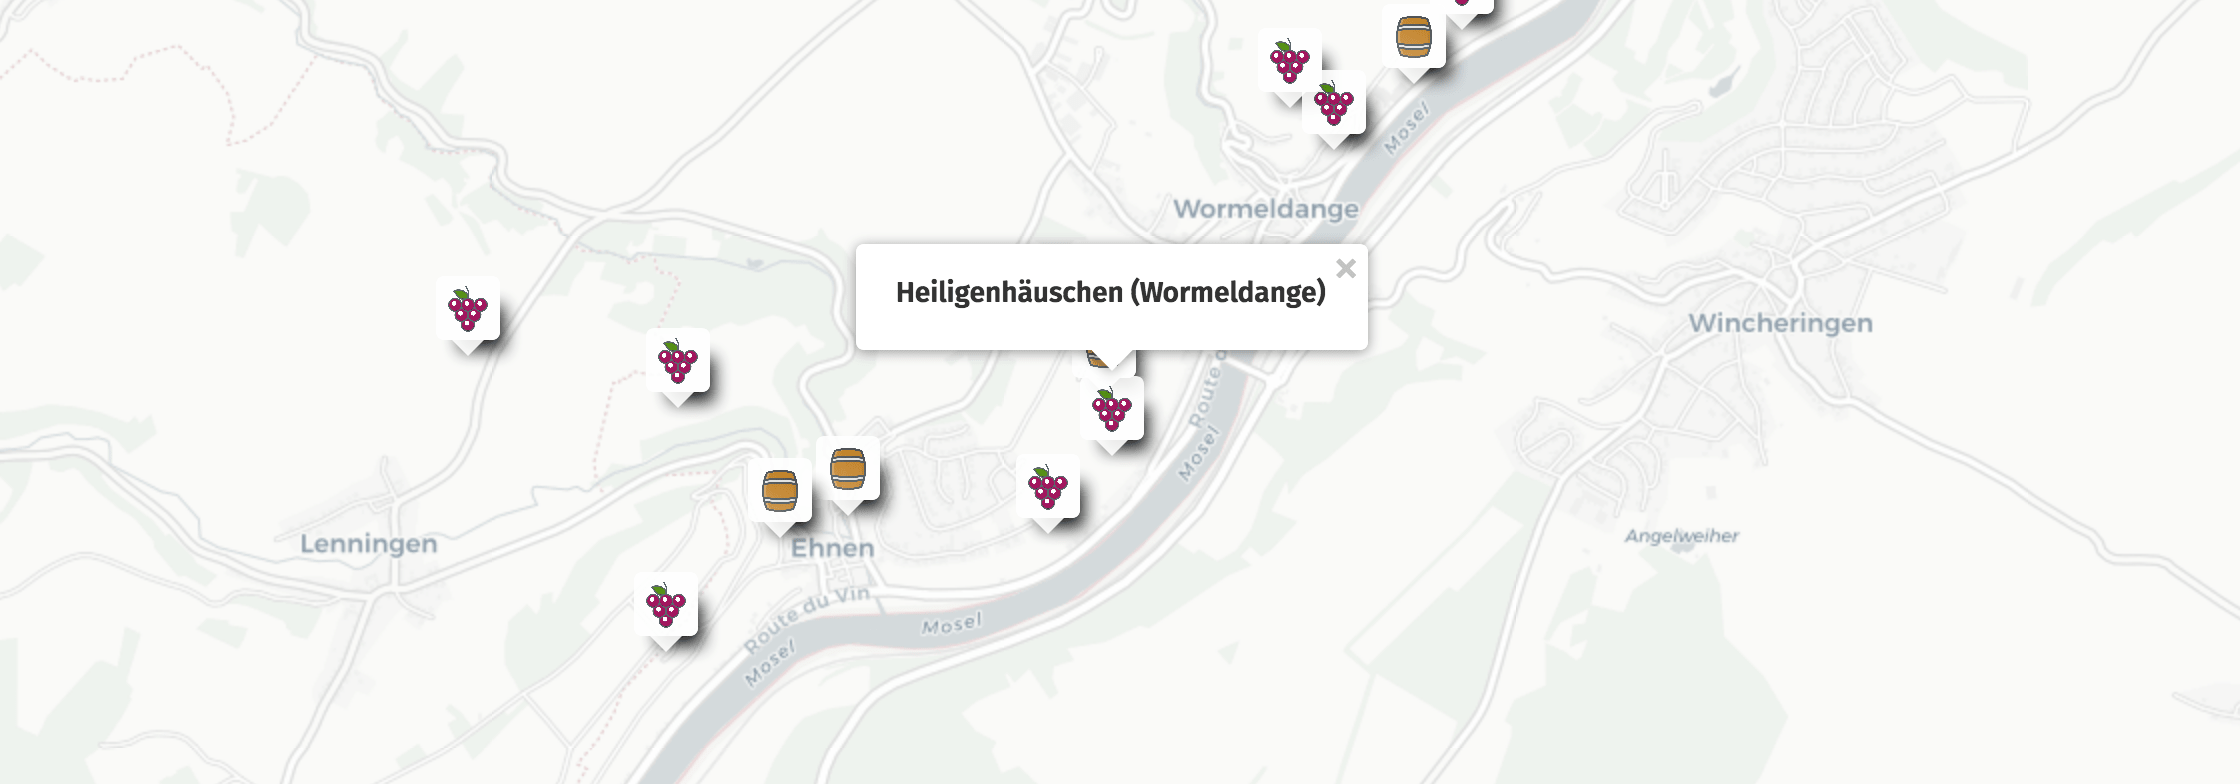 Geolocation of Heiligenhäuschen wines in Wormeldange